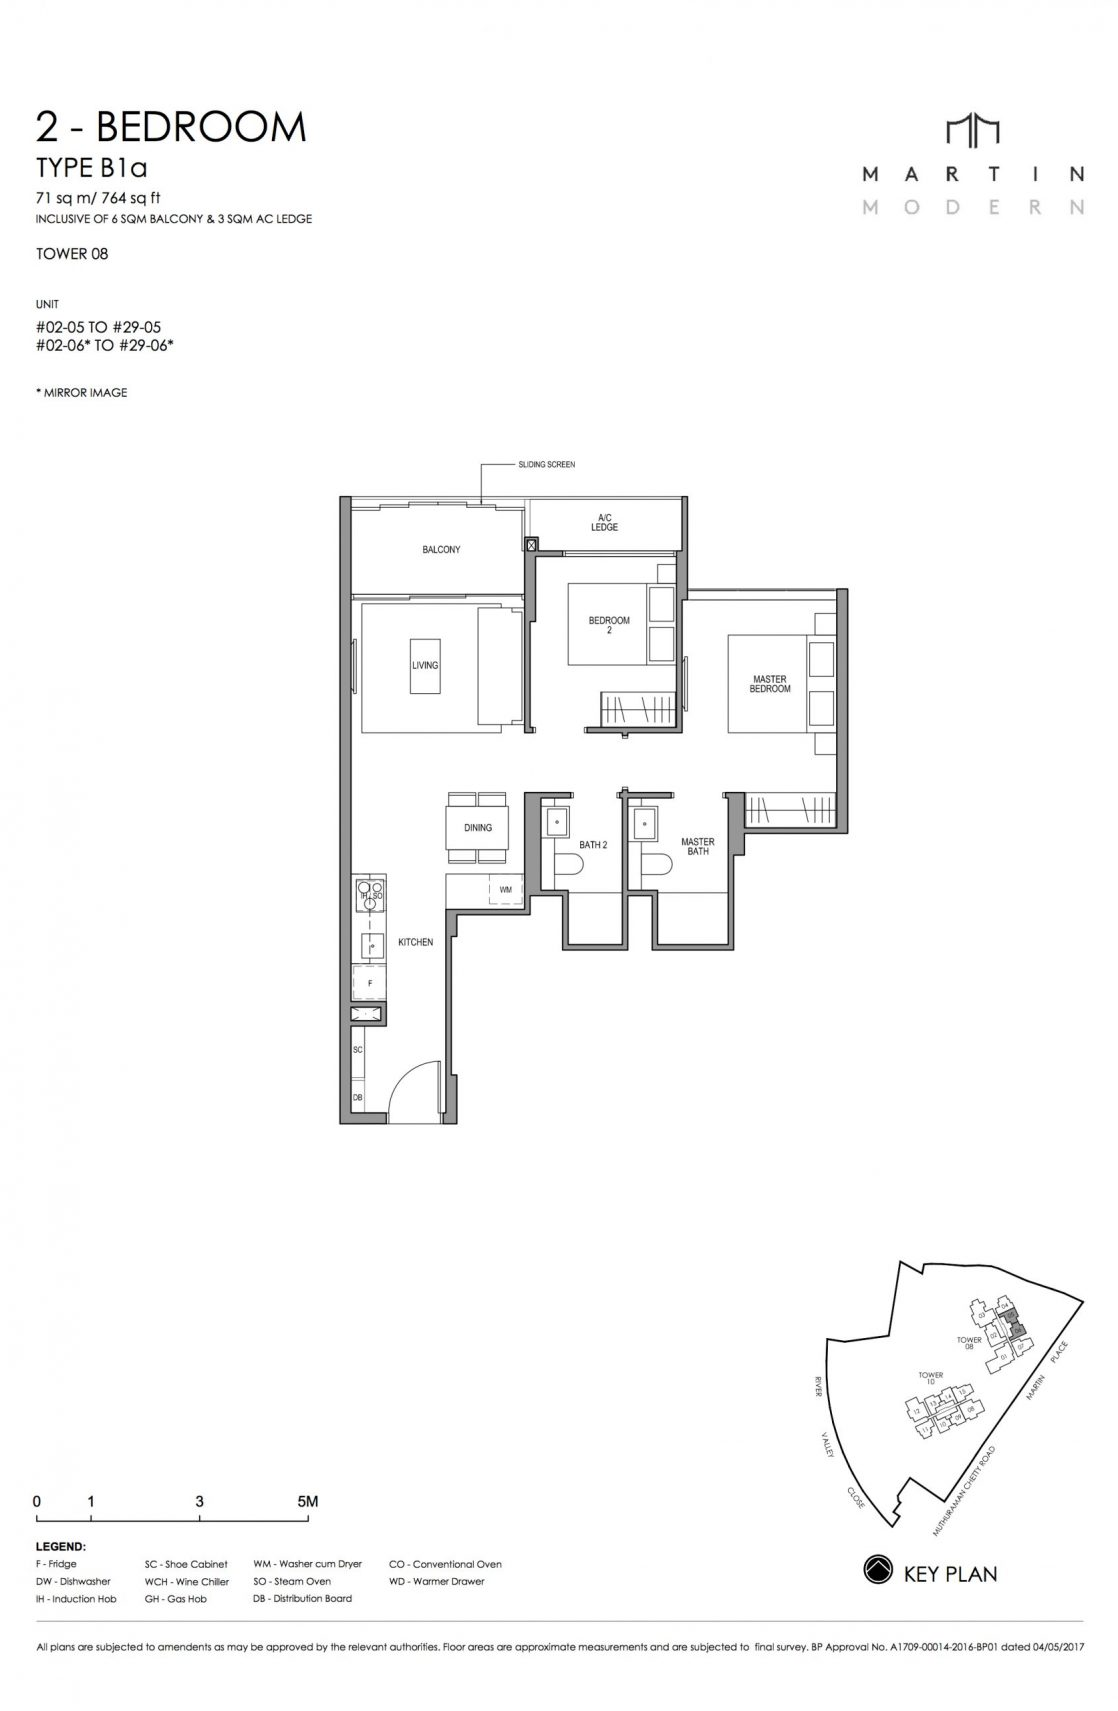 MARTIN MODERN 2-Bedroom TYPE B1a